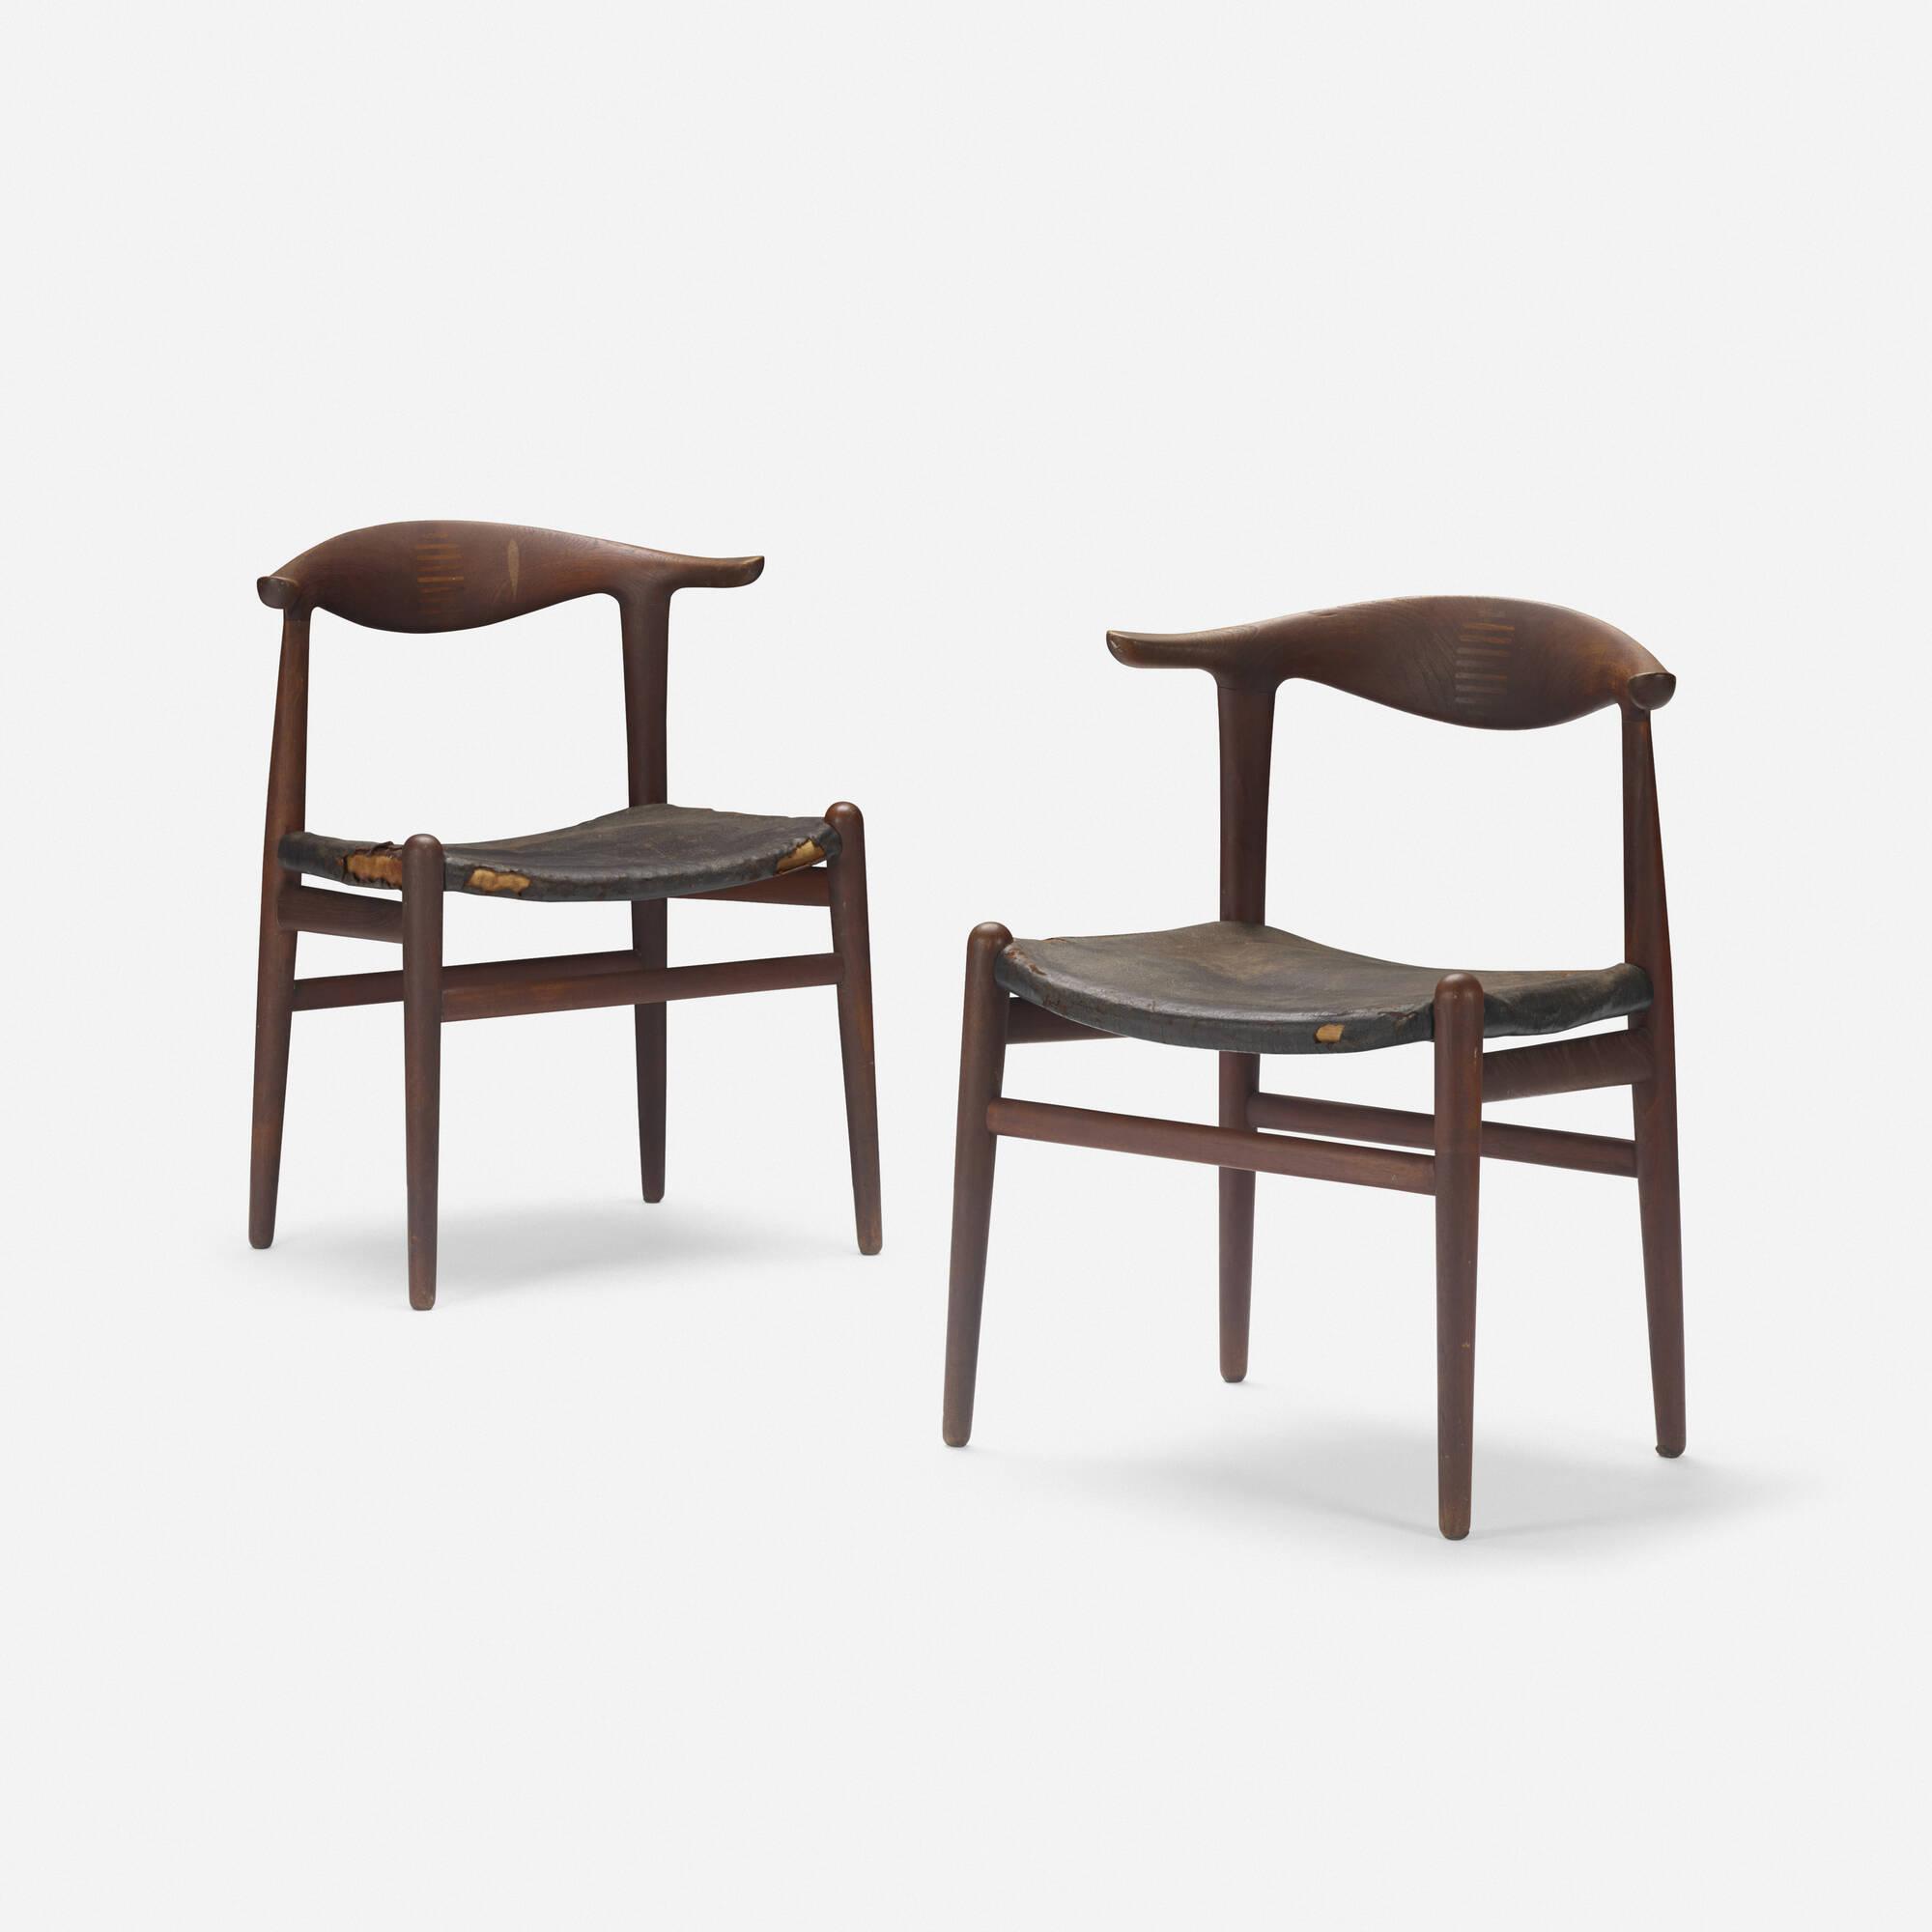 128: Hans J. Wegner / Cow Horn Chairs, Pair (1 Of 3